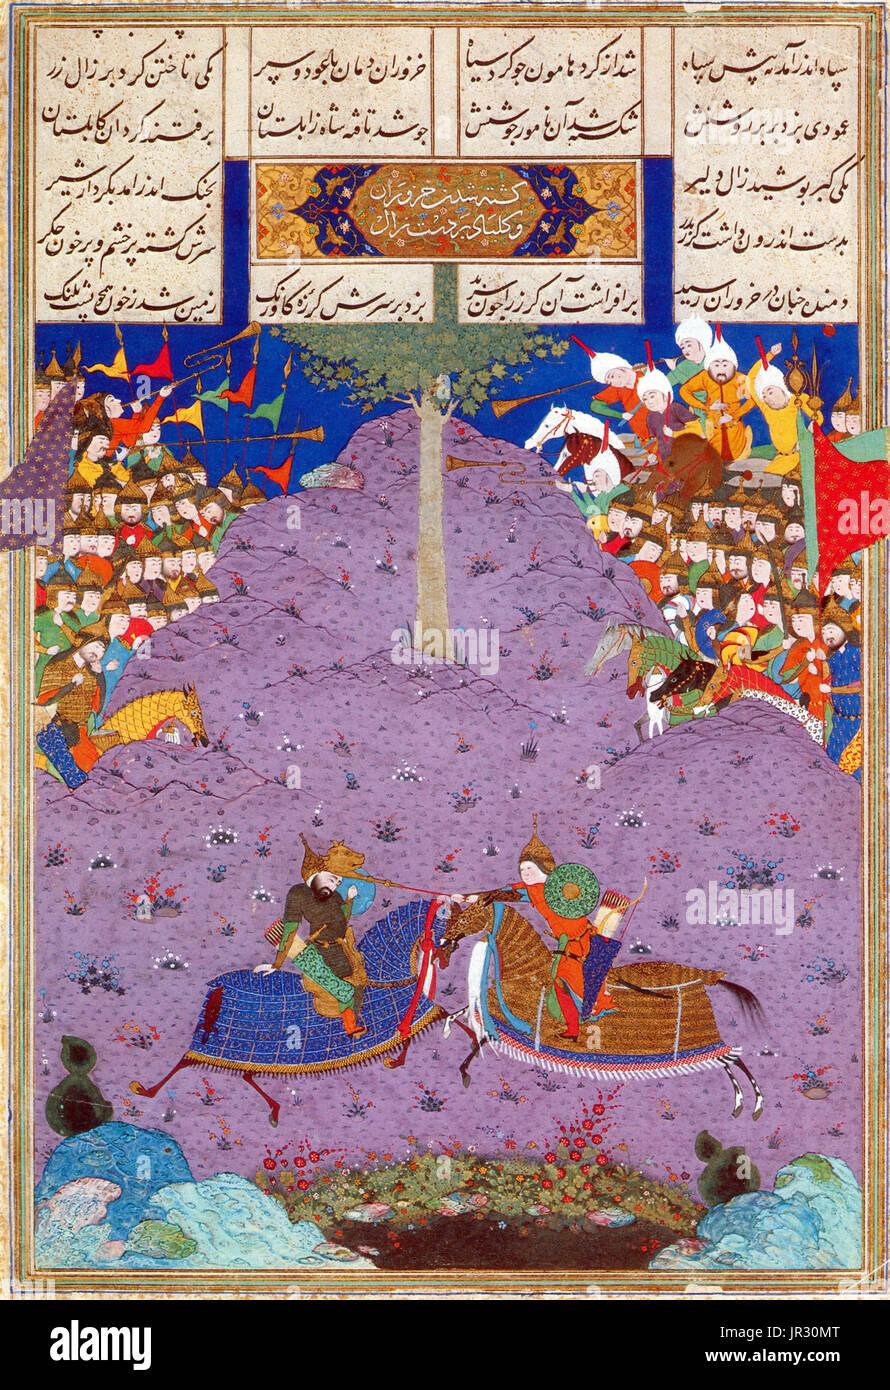 Shahnameh,Zal Slays Khazarvan - Stock Image